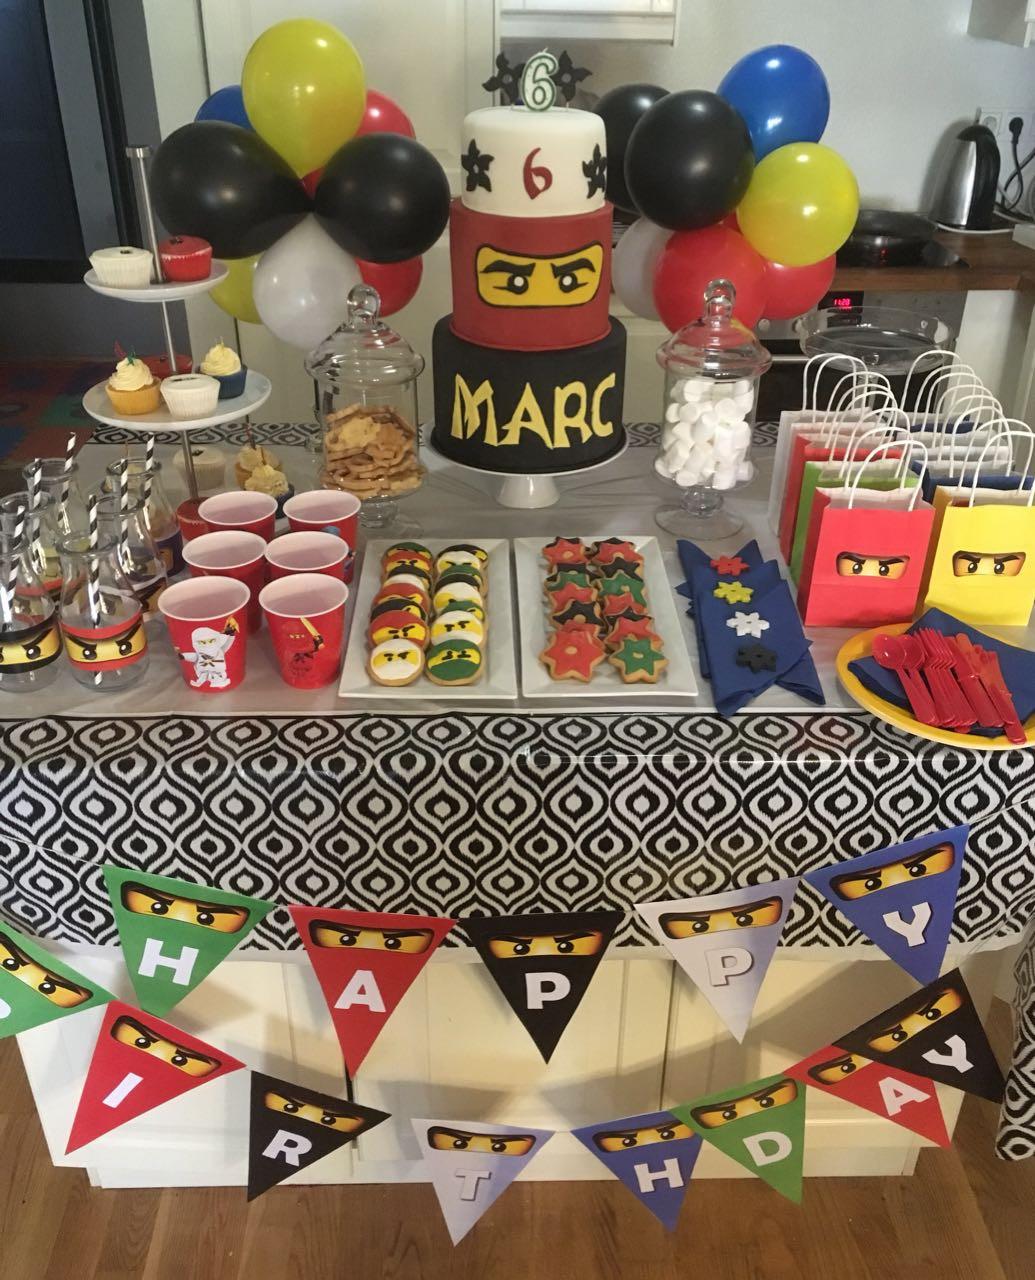 Geschenke-Spiele-Ideen  Nonjago Kindergeburtstag Spiele Deko Geschenke